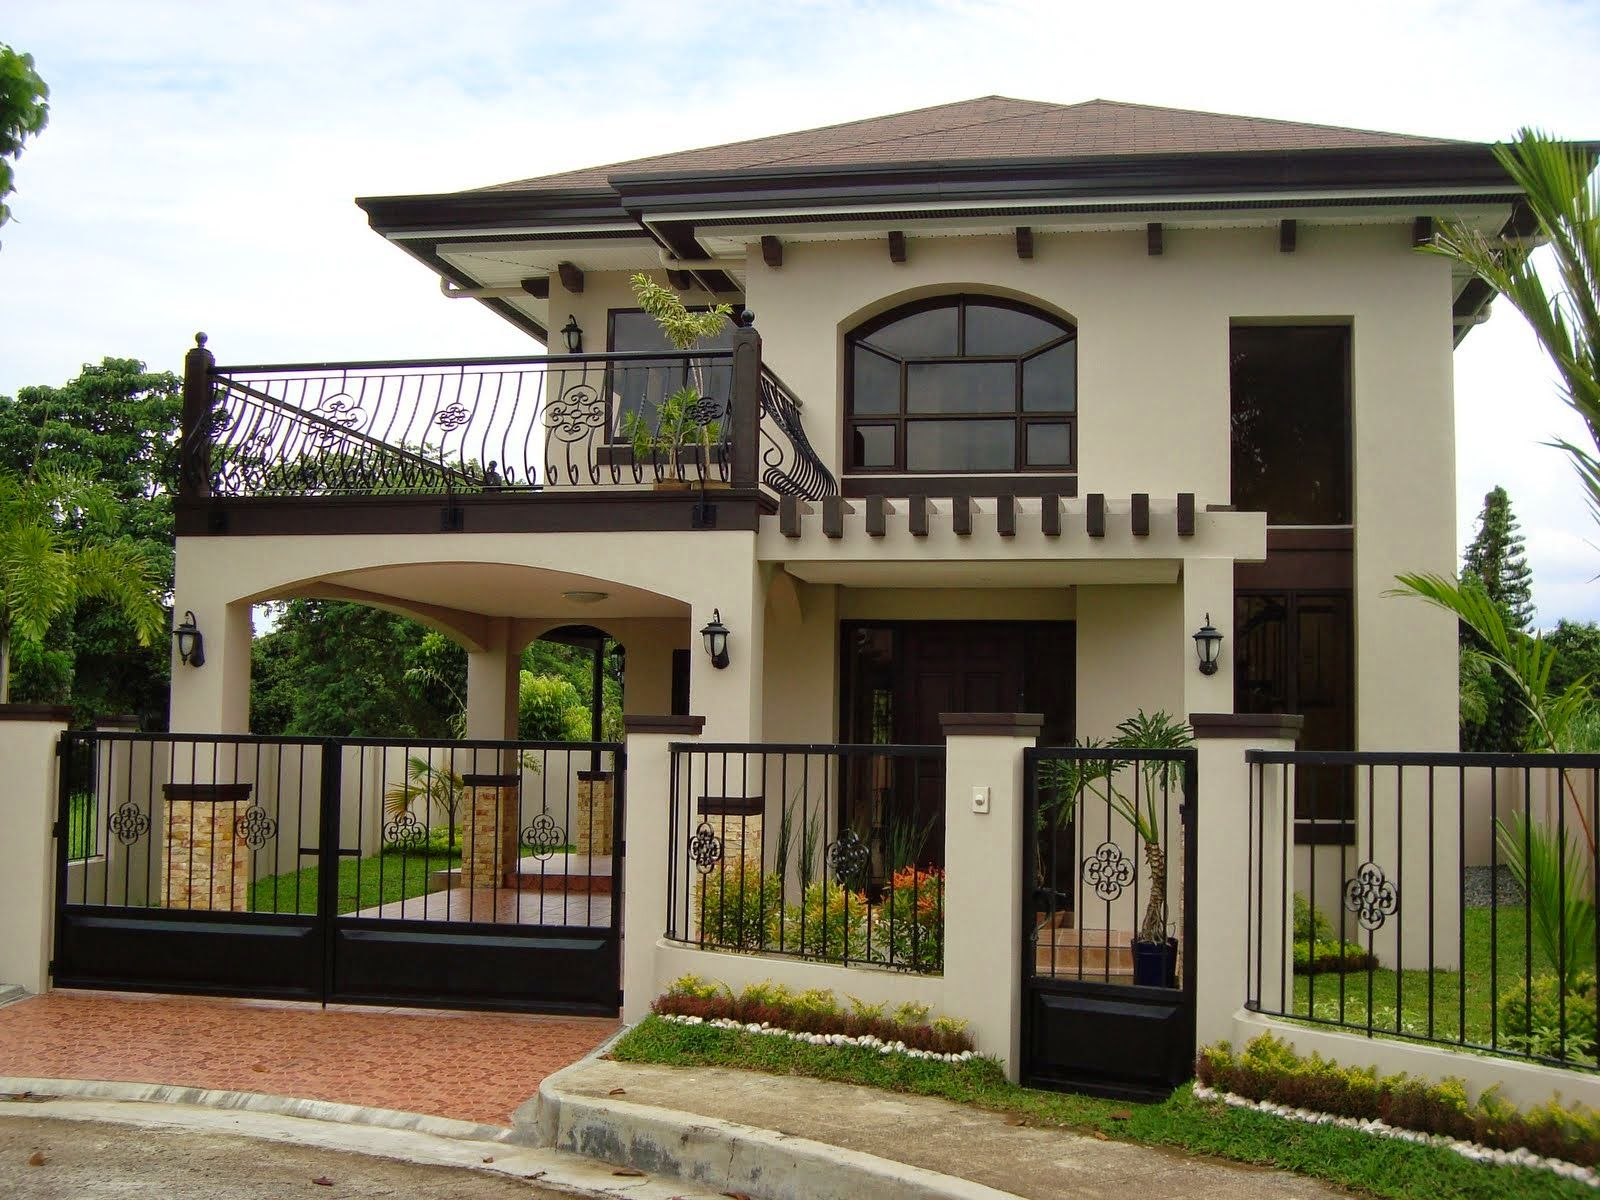 Pin Moniquesensei 2 Storey House Design House With Balcony Simple House Plans